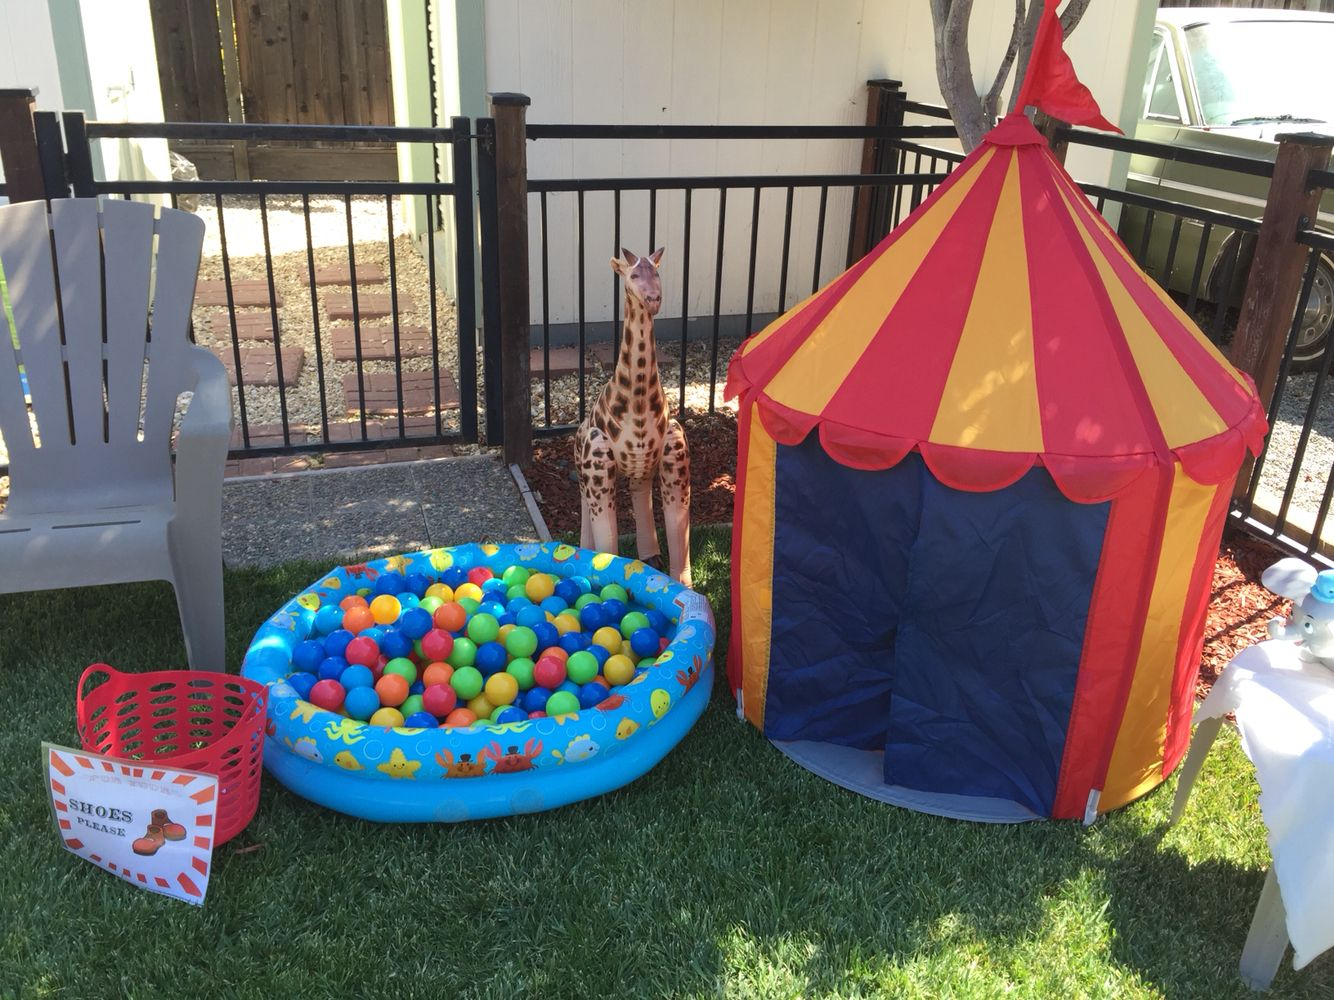 Circus Party Toddler Play Zone - DIY ball pit u0026 Ikea kids tent! & Circus Party Toddler Play Zone - DIY ball pit u0026 Ikea kids tent ...